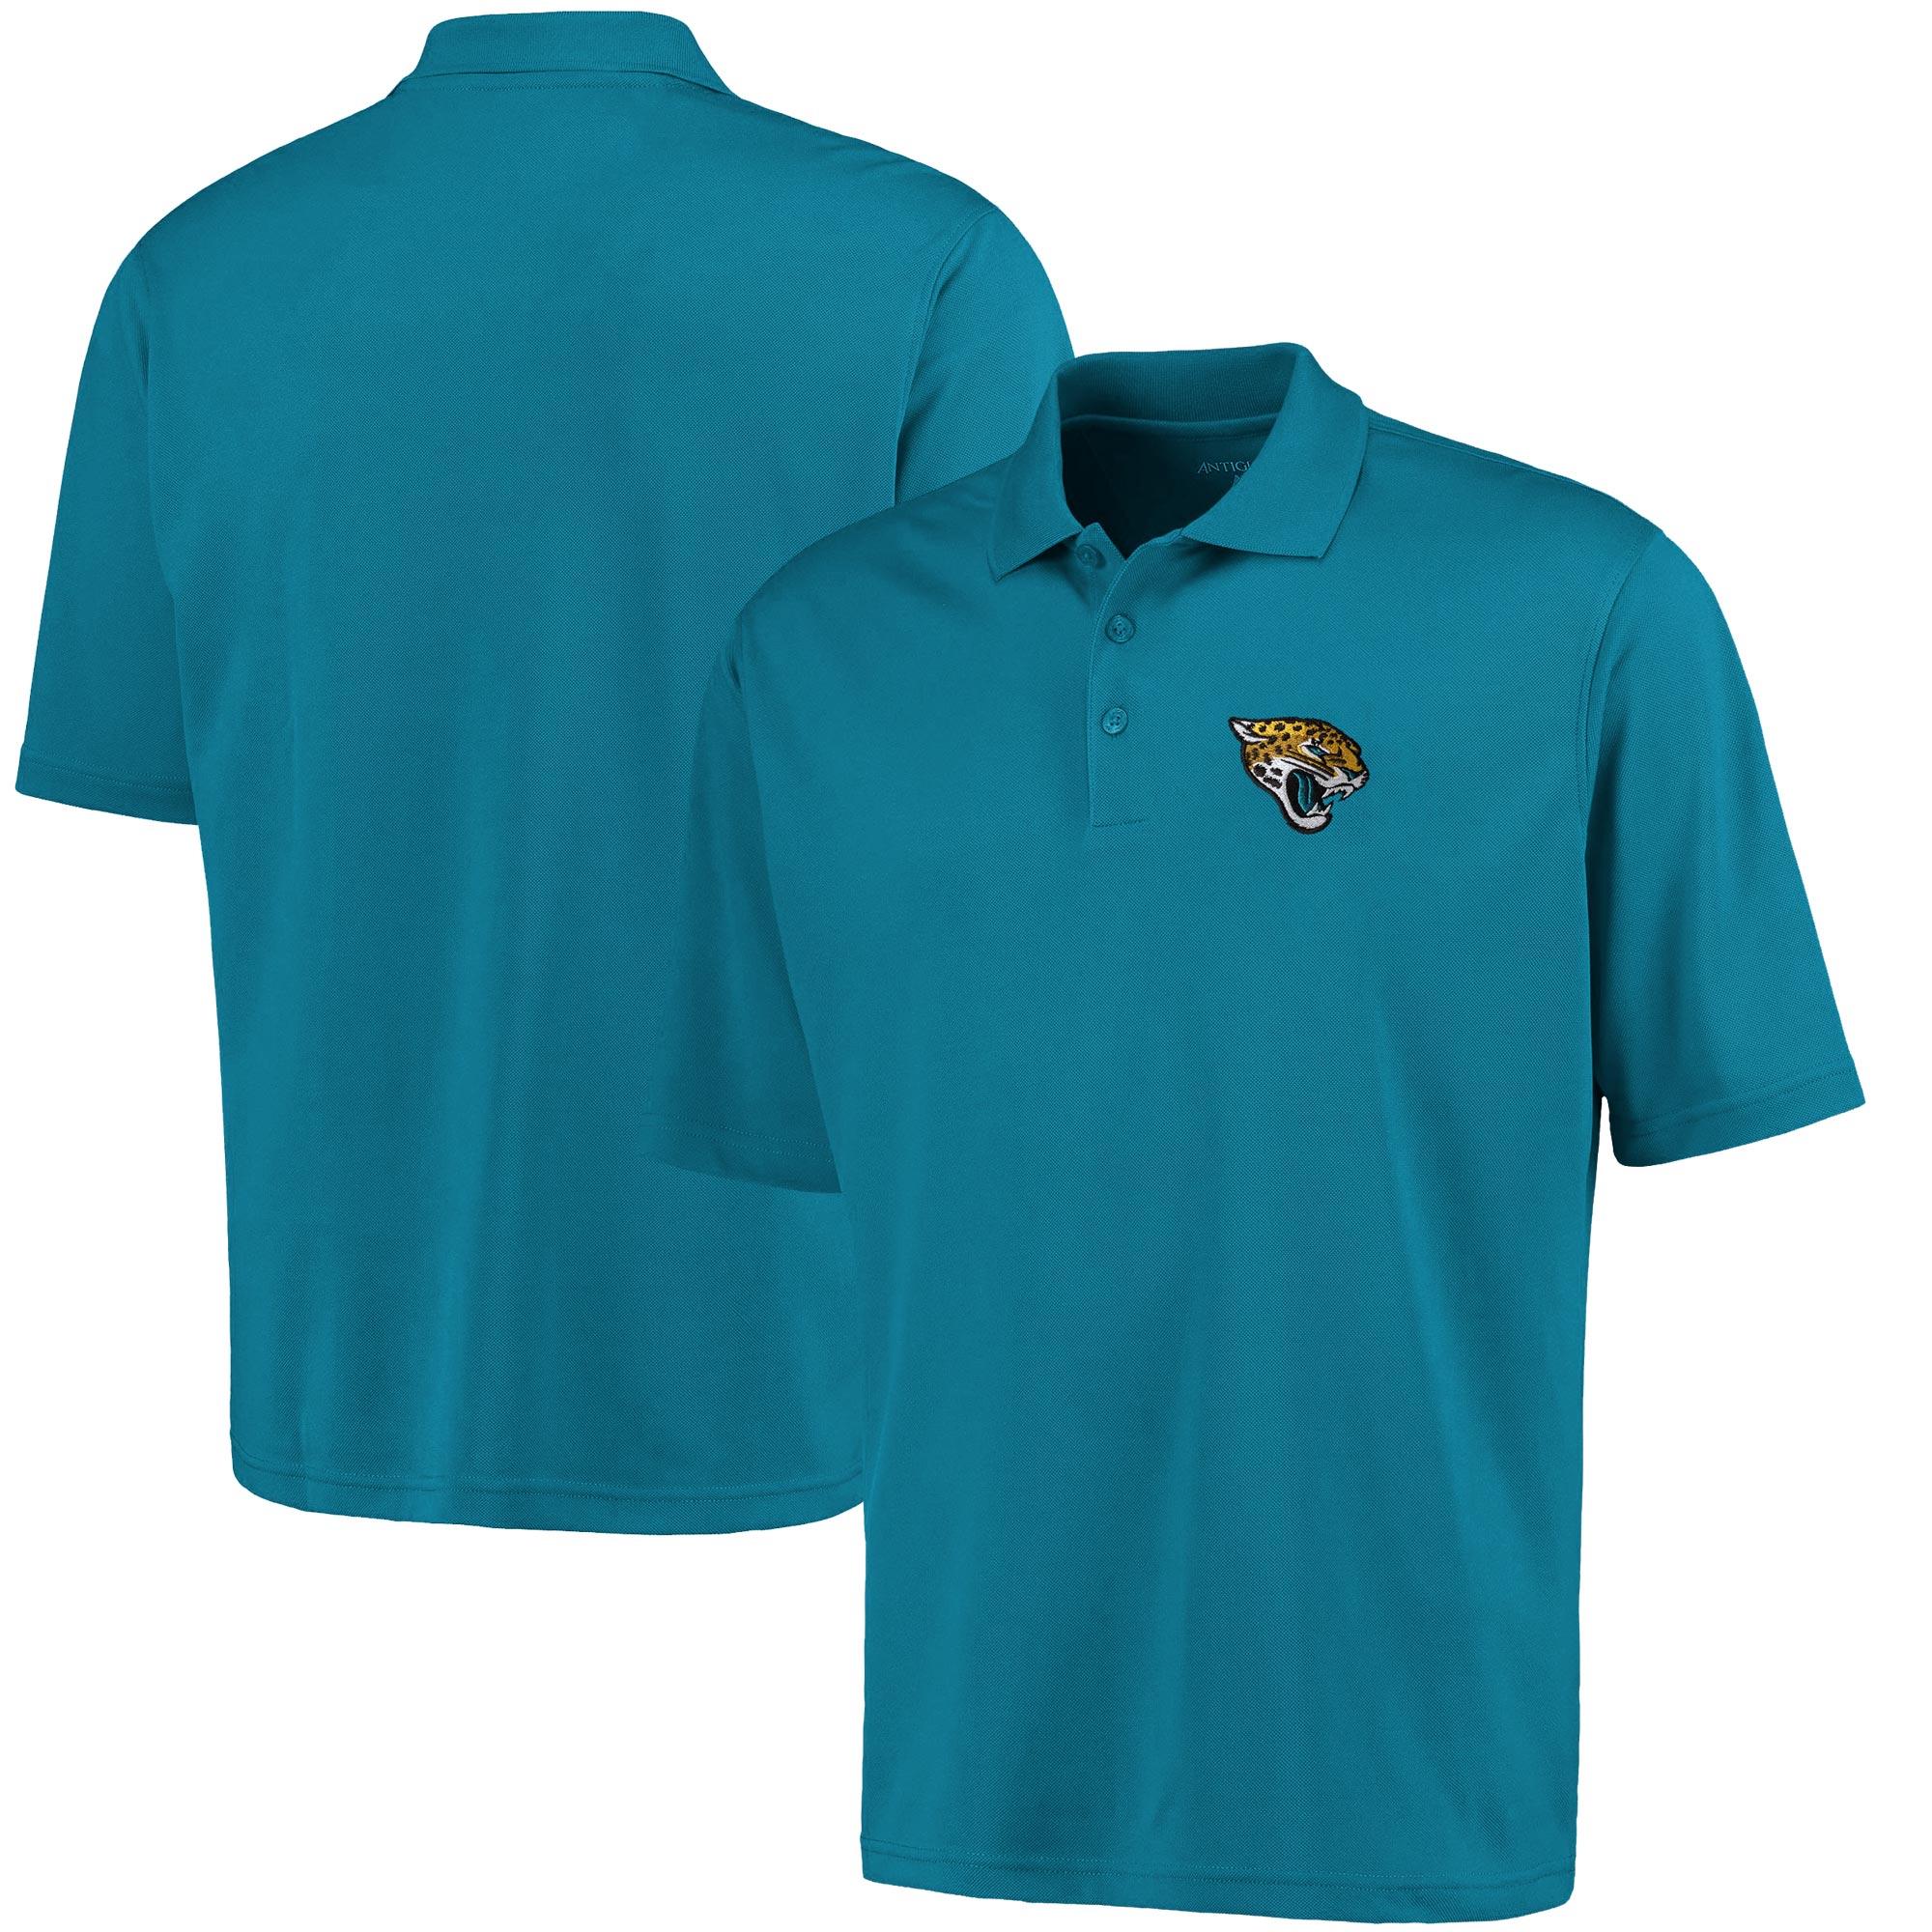 Jacksonville Jaguars Antigua Pique Xtra Lite Polo - Teal